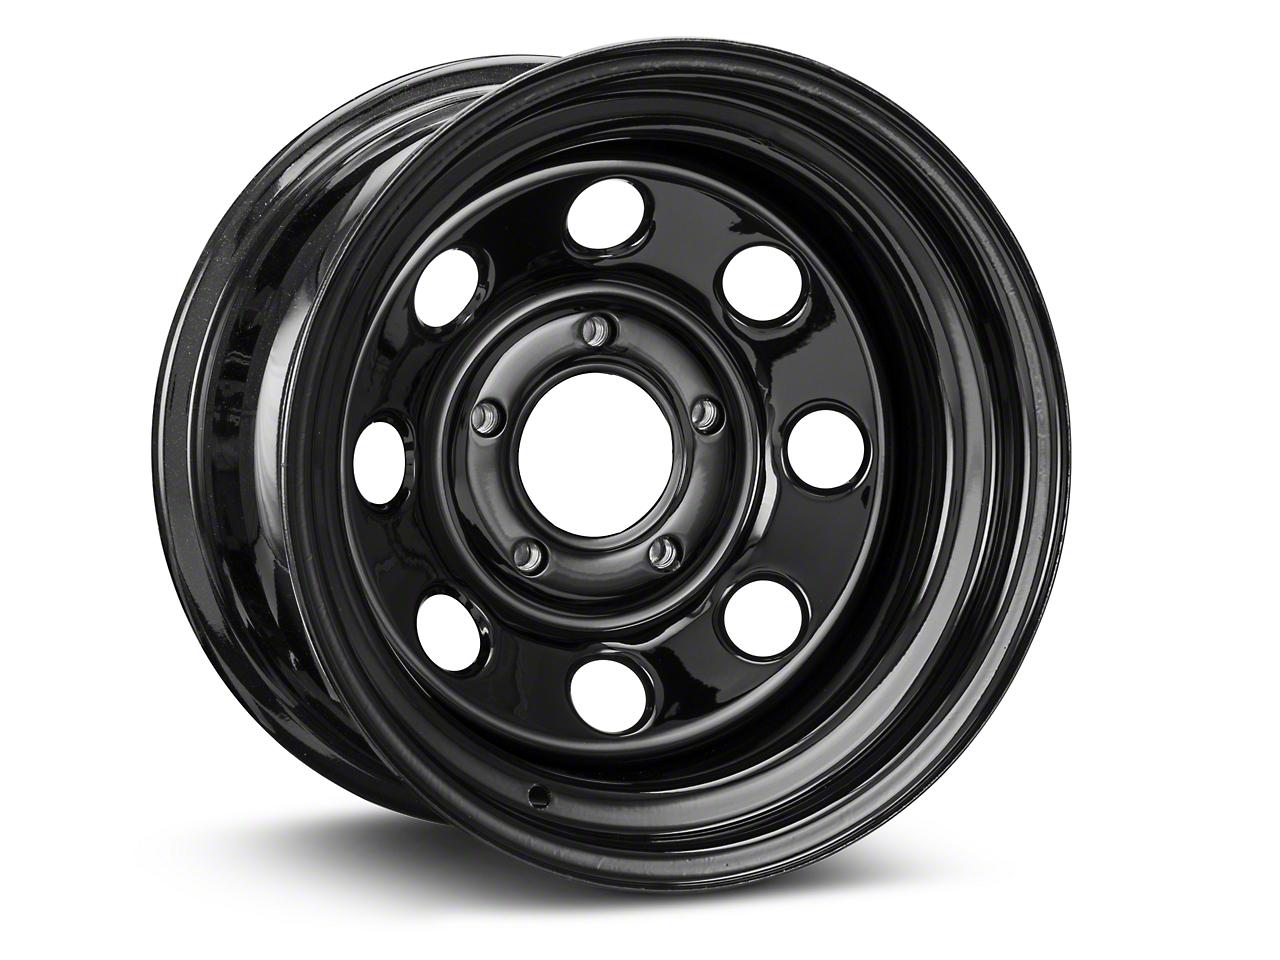 Pro Comp Steel Series 98 Rock Crawler Gloss Black Wheel - 15x8 (07-17 Wrangler JK)